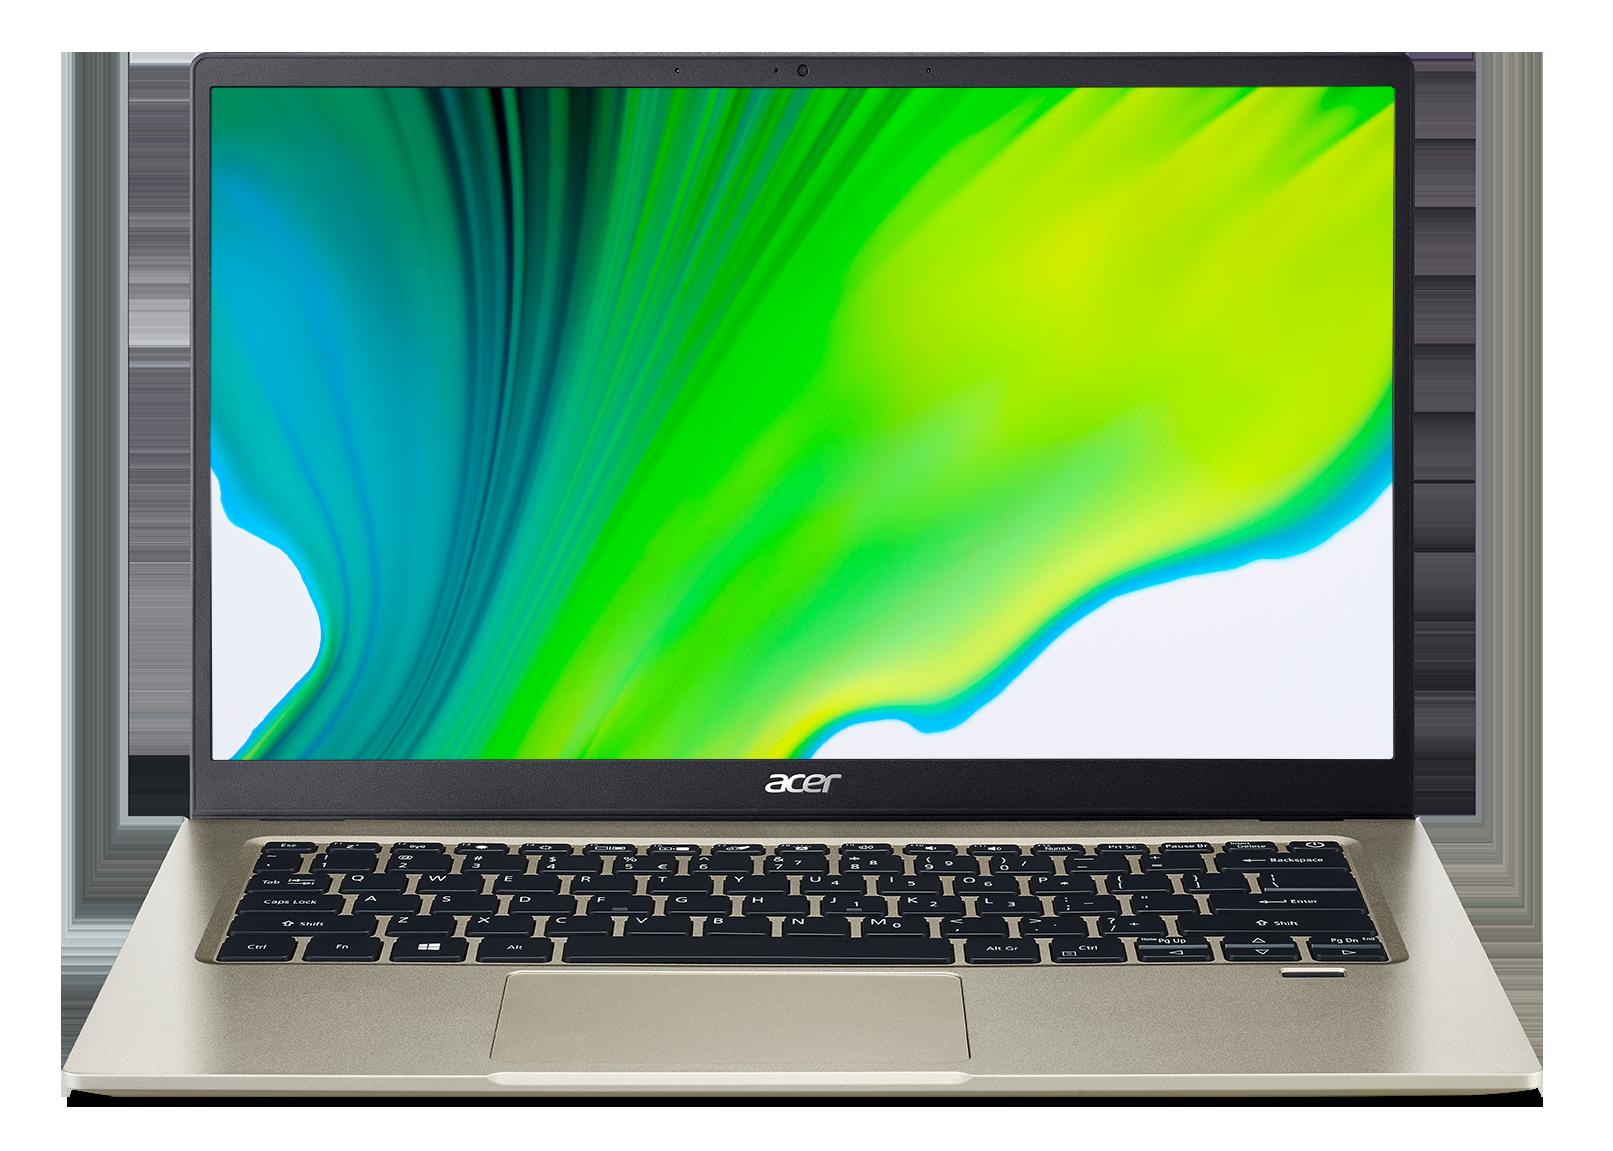 Acer Swift 1 - 14''/N6000/4G/128SSD NVMe/IPS FHD/W10S zlatý + Microsoft 365 - NX.A7BEC.002